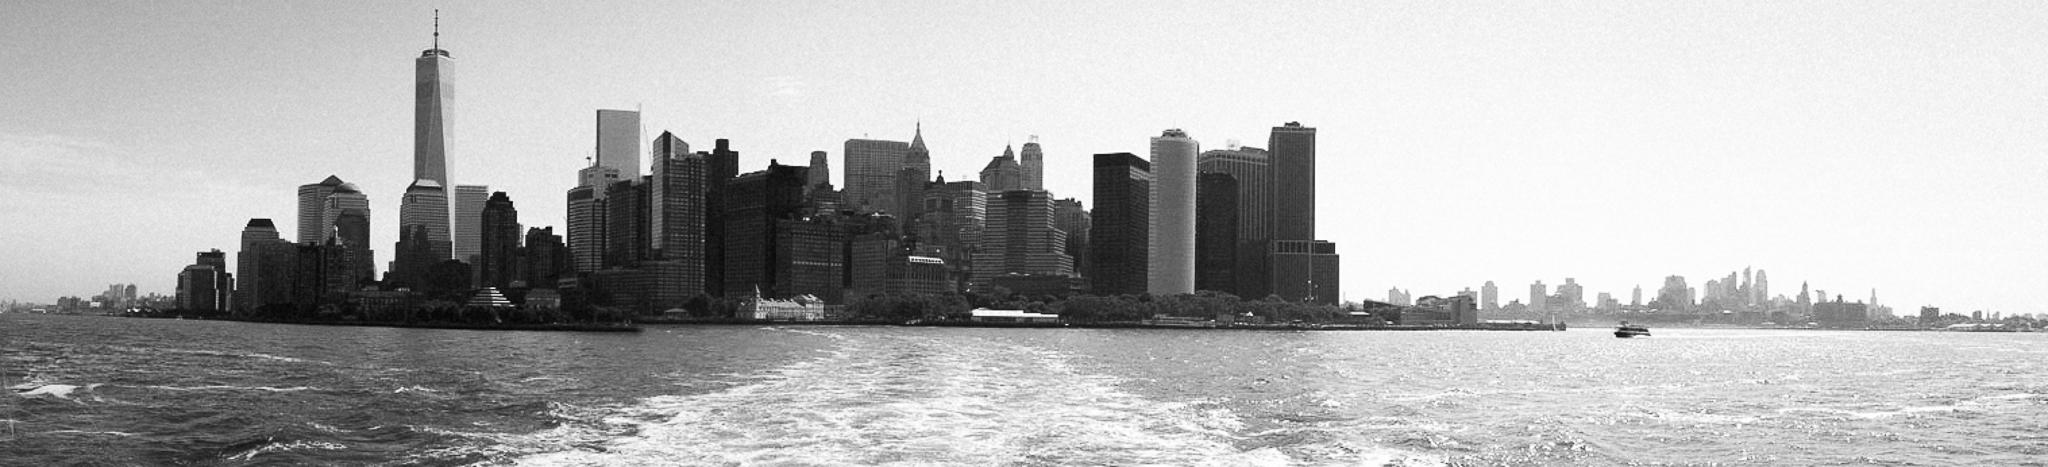 2015-05-14-NYC-5011.jpg